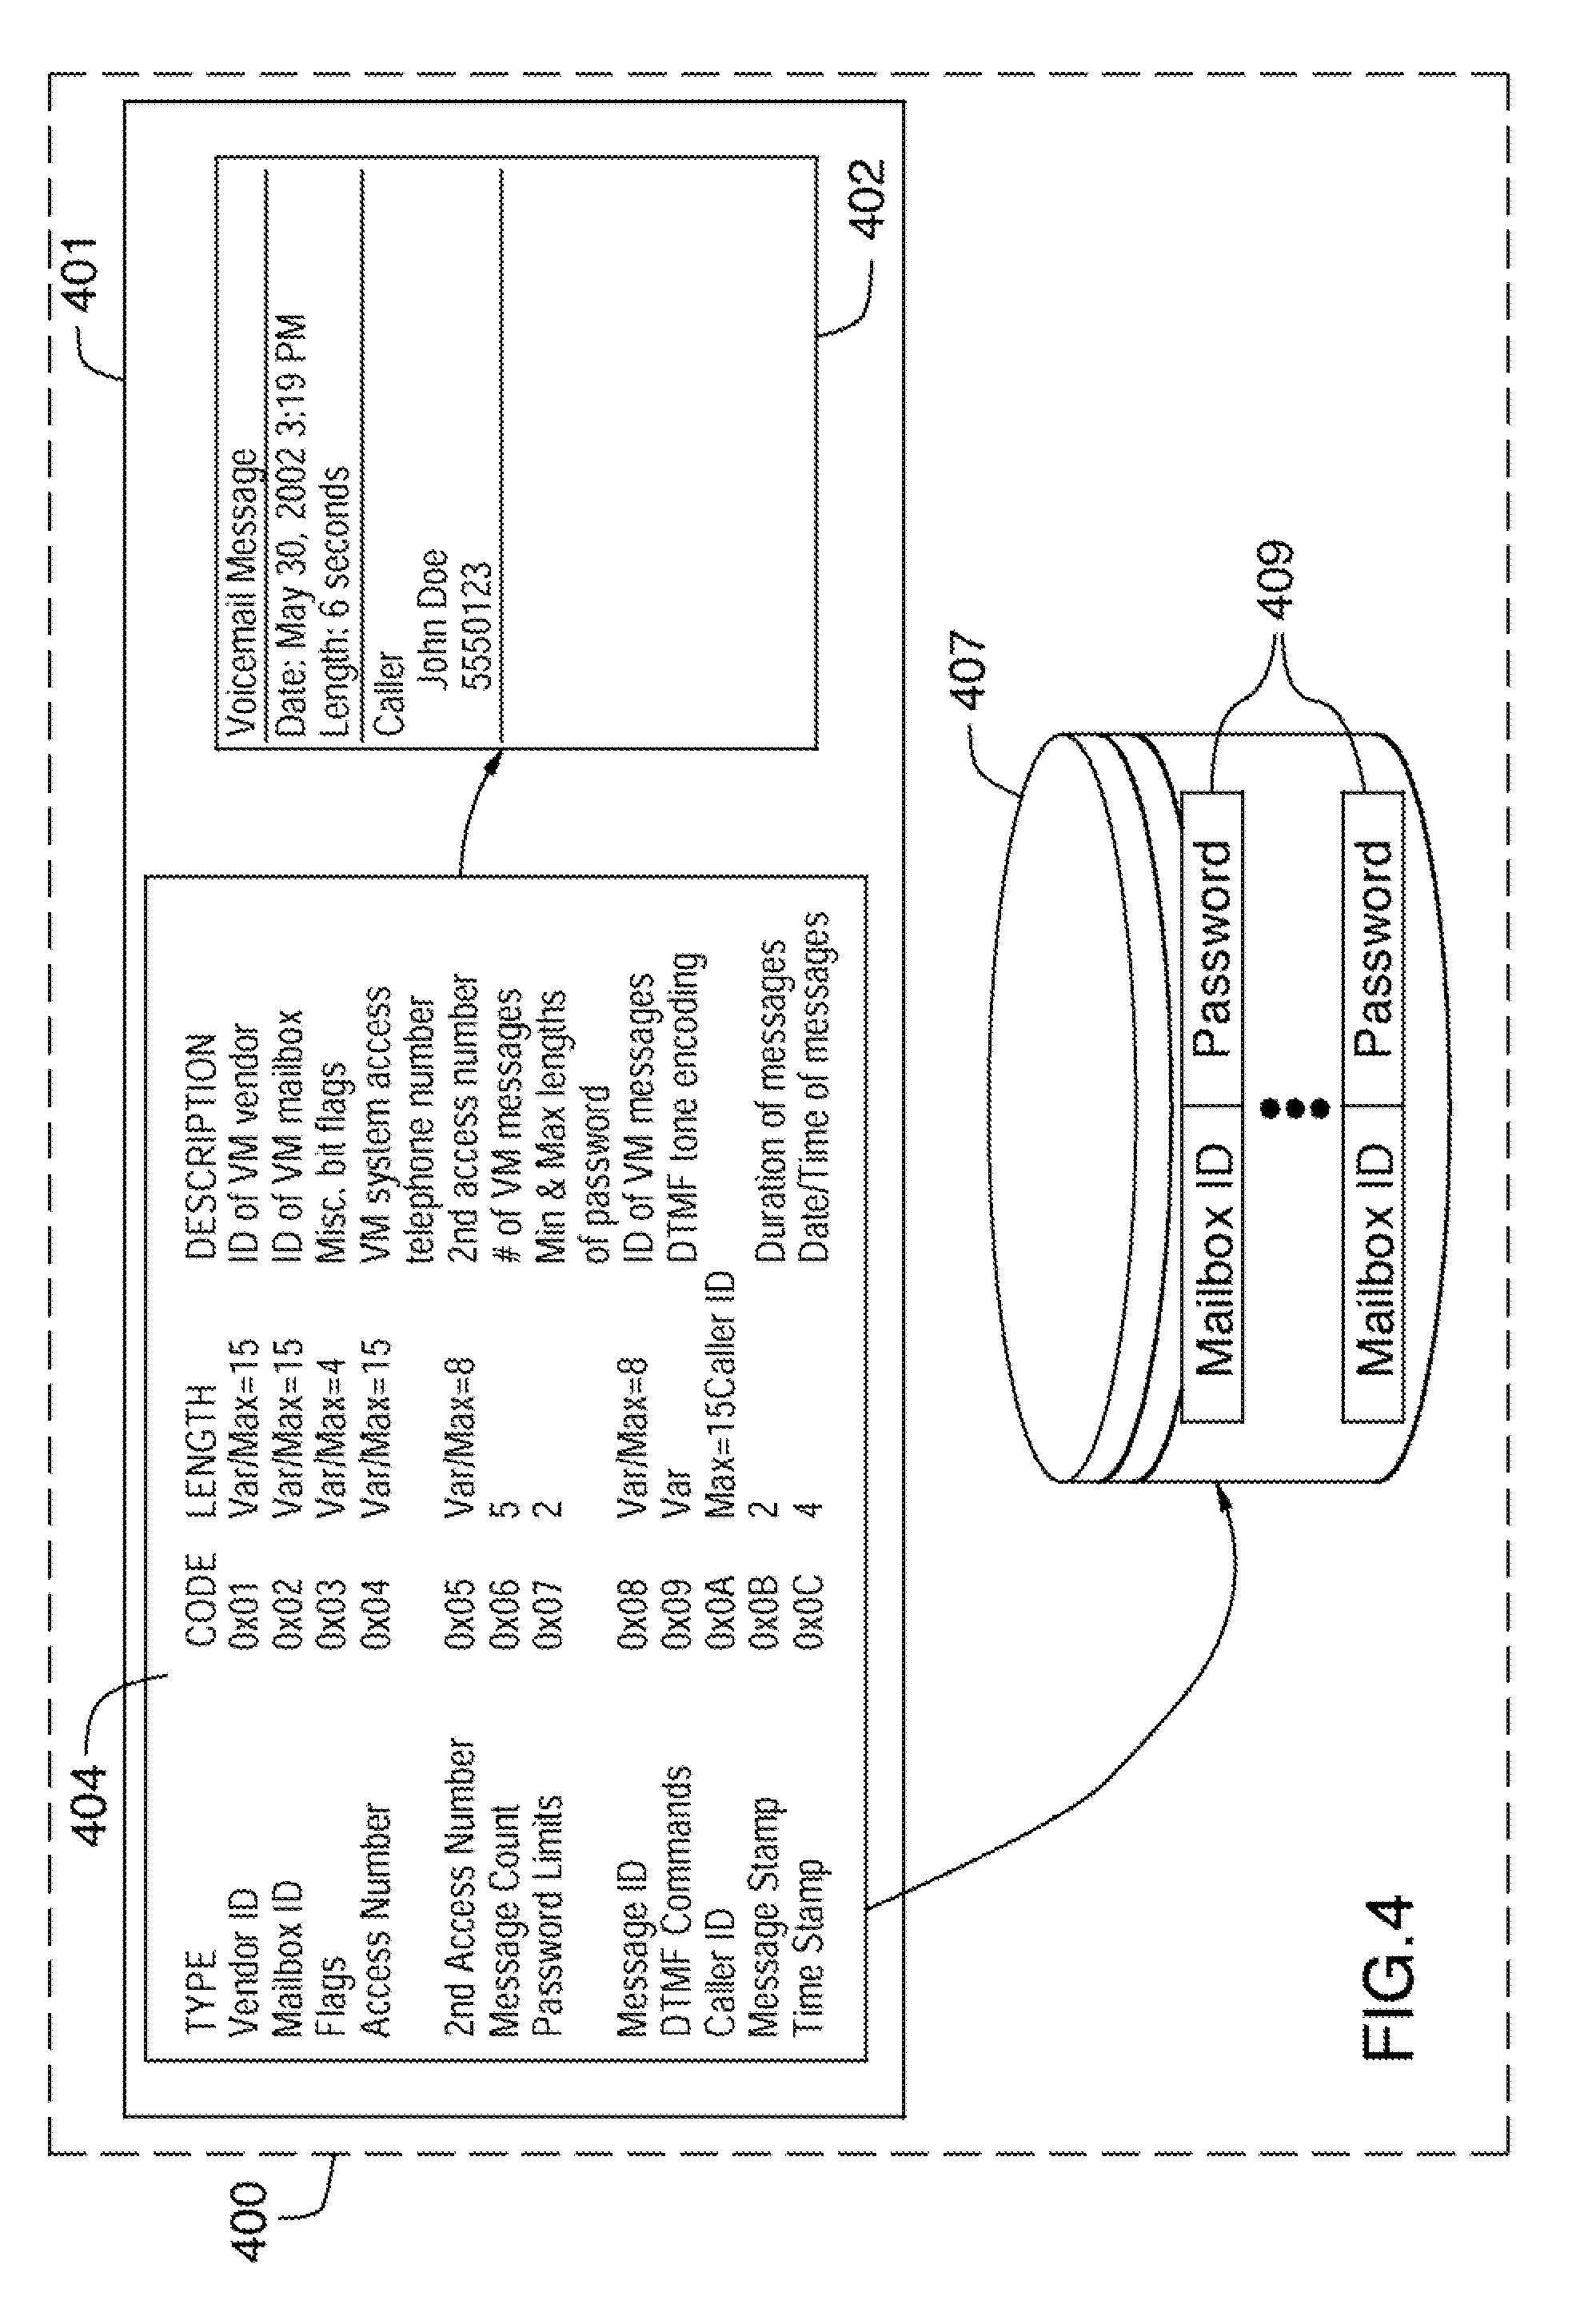 Patent Us20100297984 Voice Mailbox Configuration Methods And